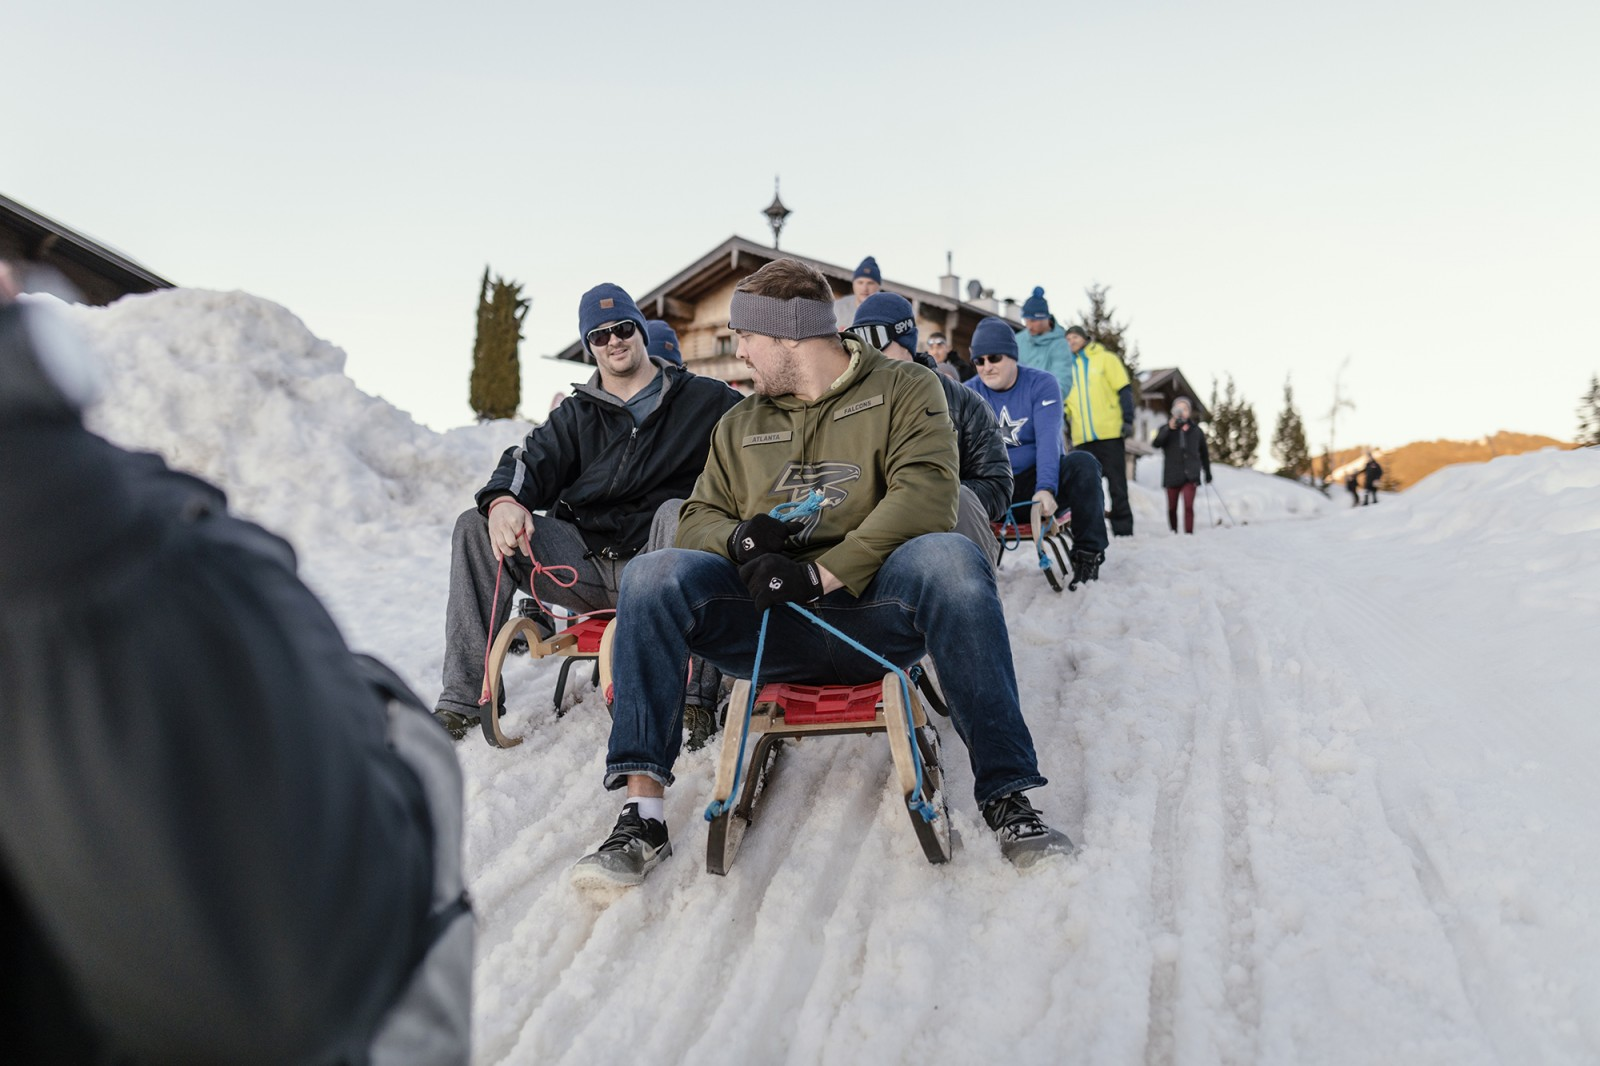 (c) SalzburgerLand Tourismus/ LUX FUX Media